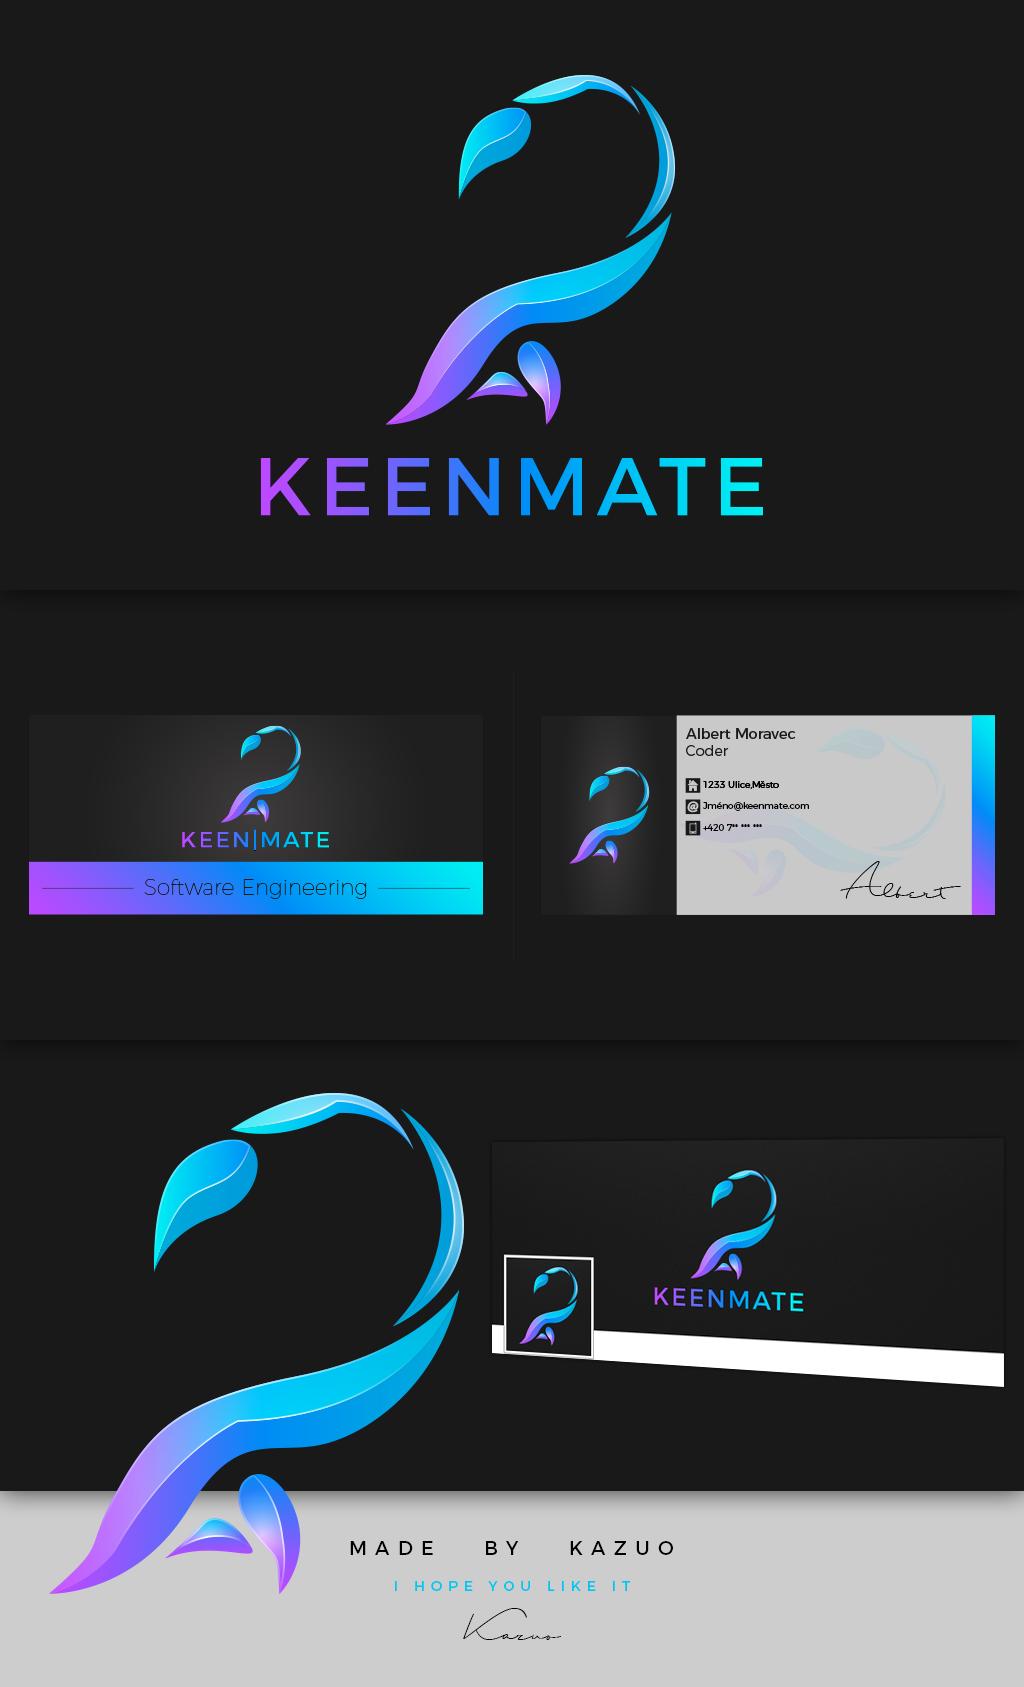 keenmate logo by kazuocz on deviantart